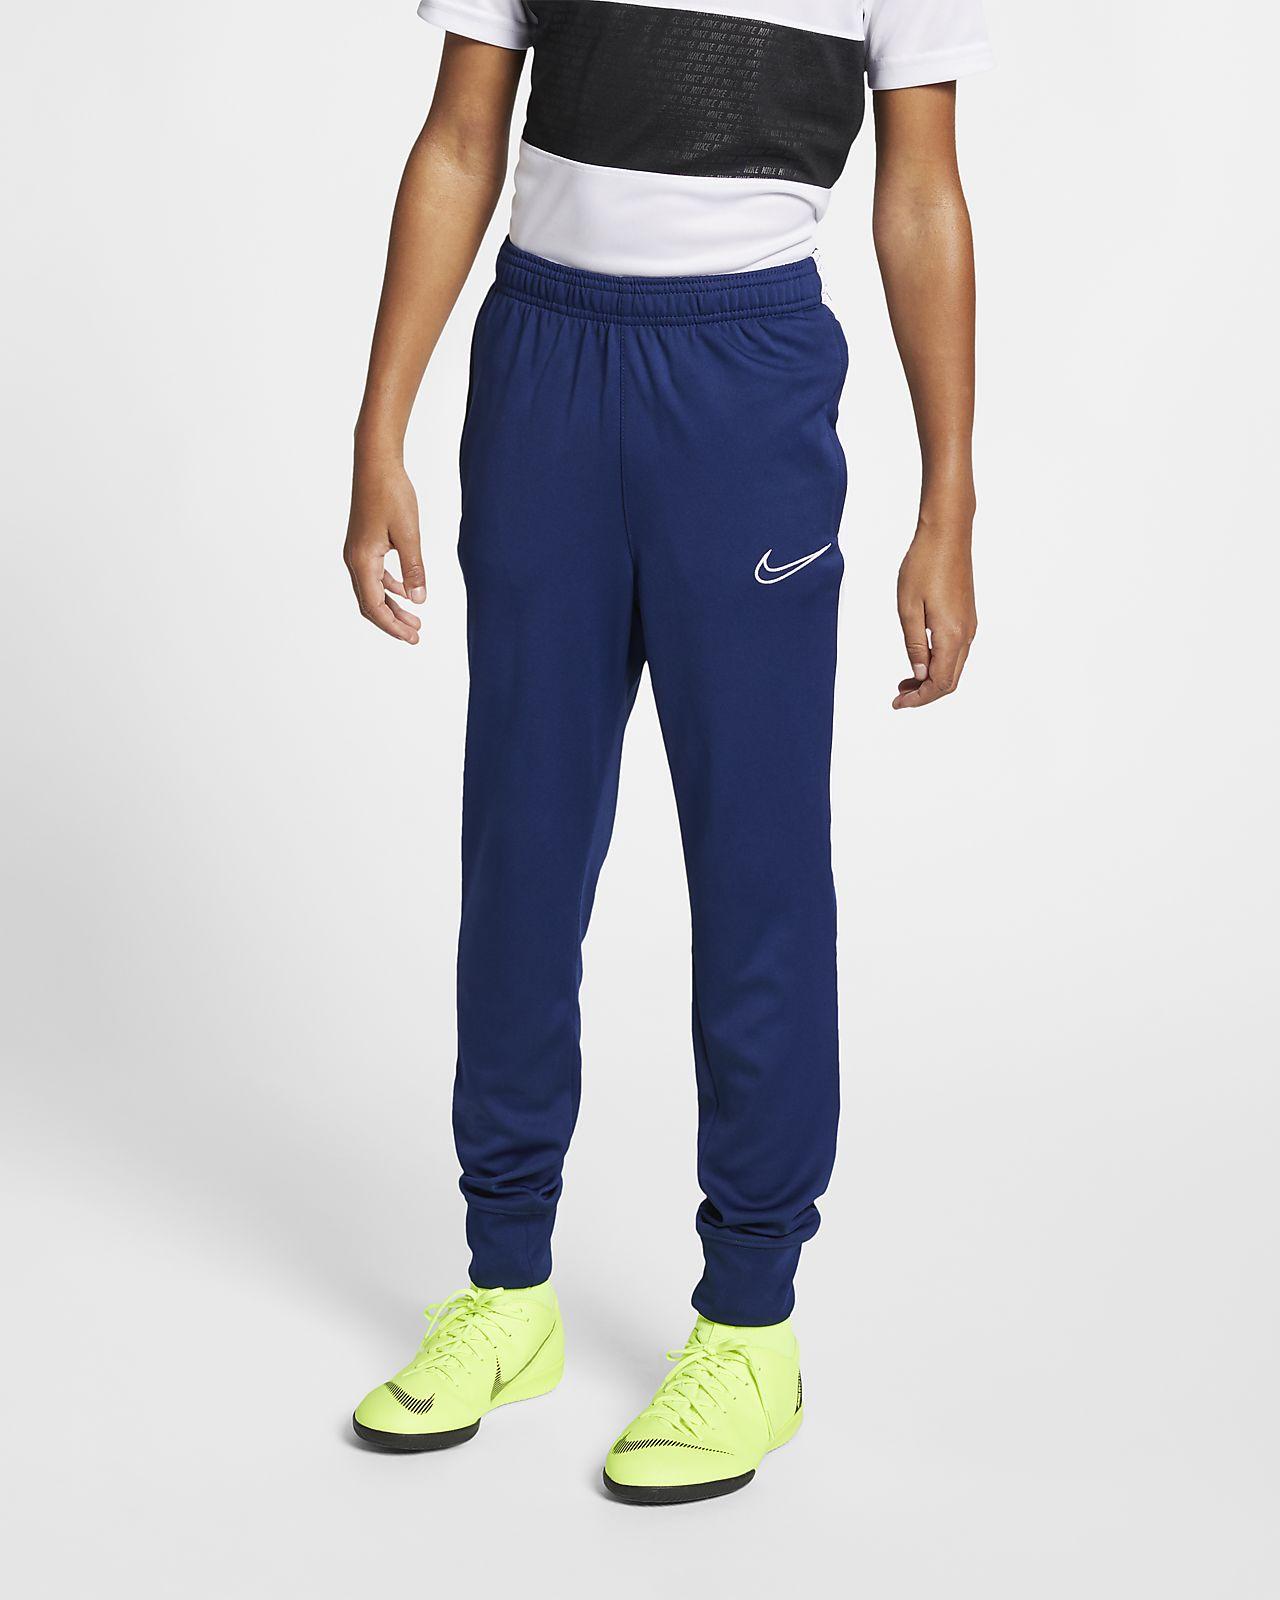 596052e8cca94 Nike Dri-FIT Academy Older Kids' Football Pants. Nike.com GB